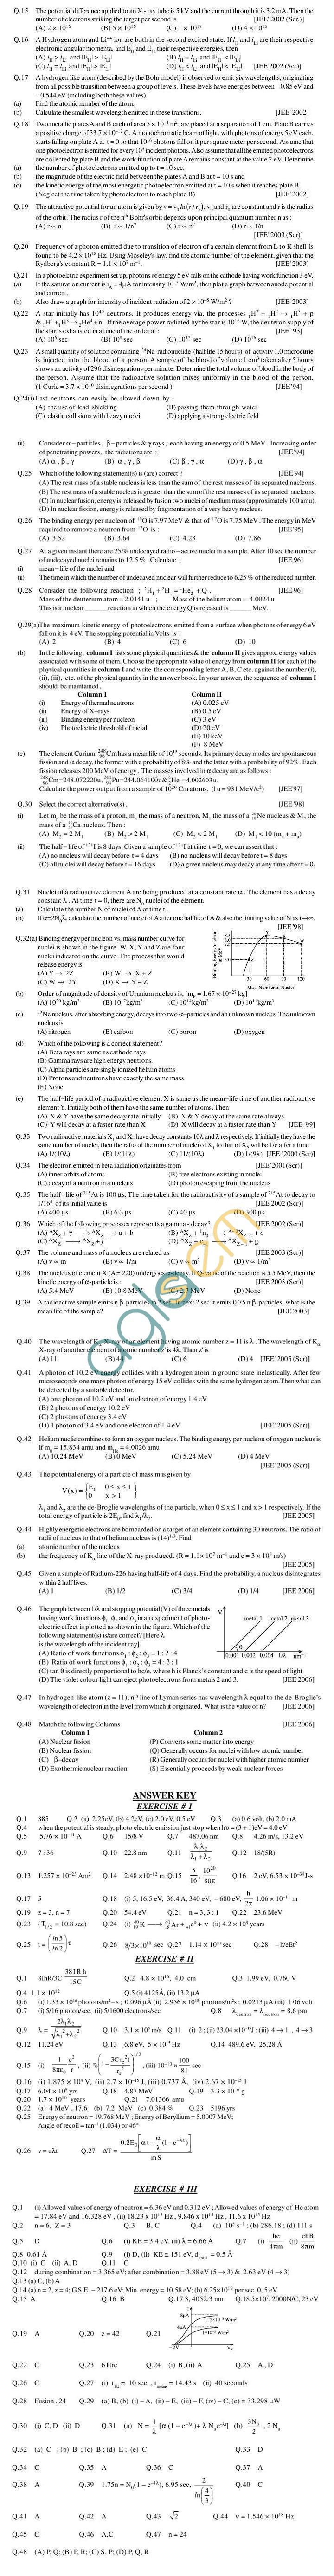 Physics Study Material - Modern Physics